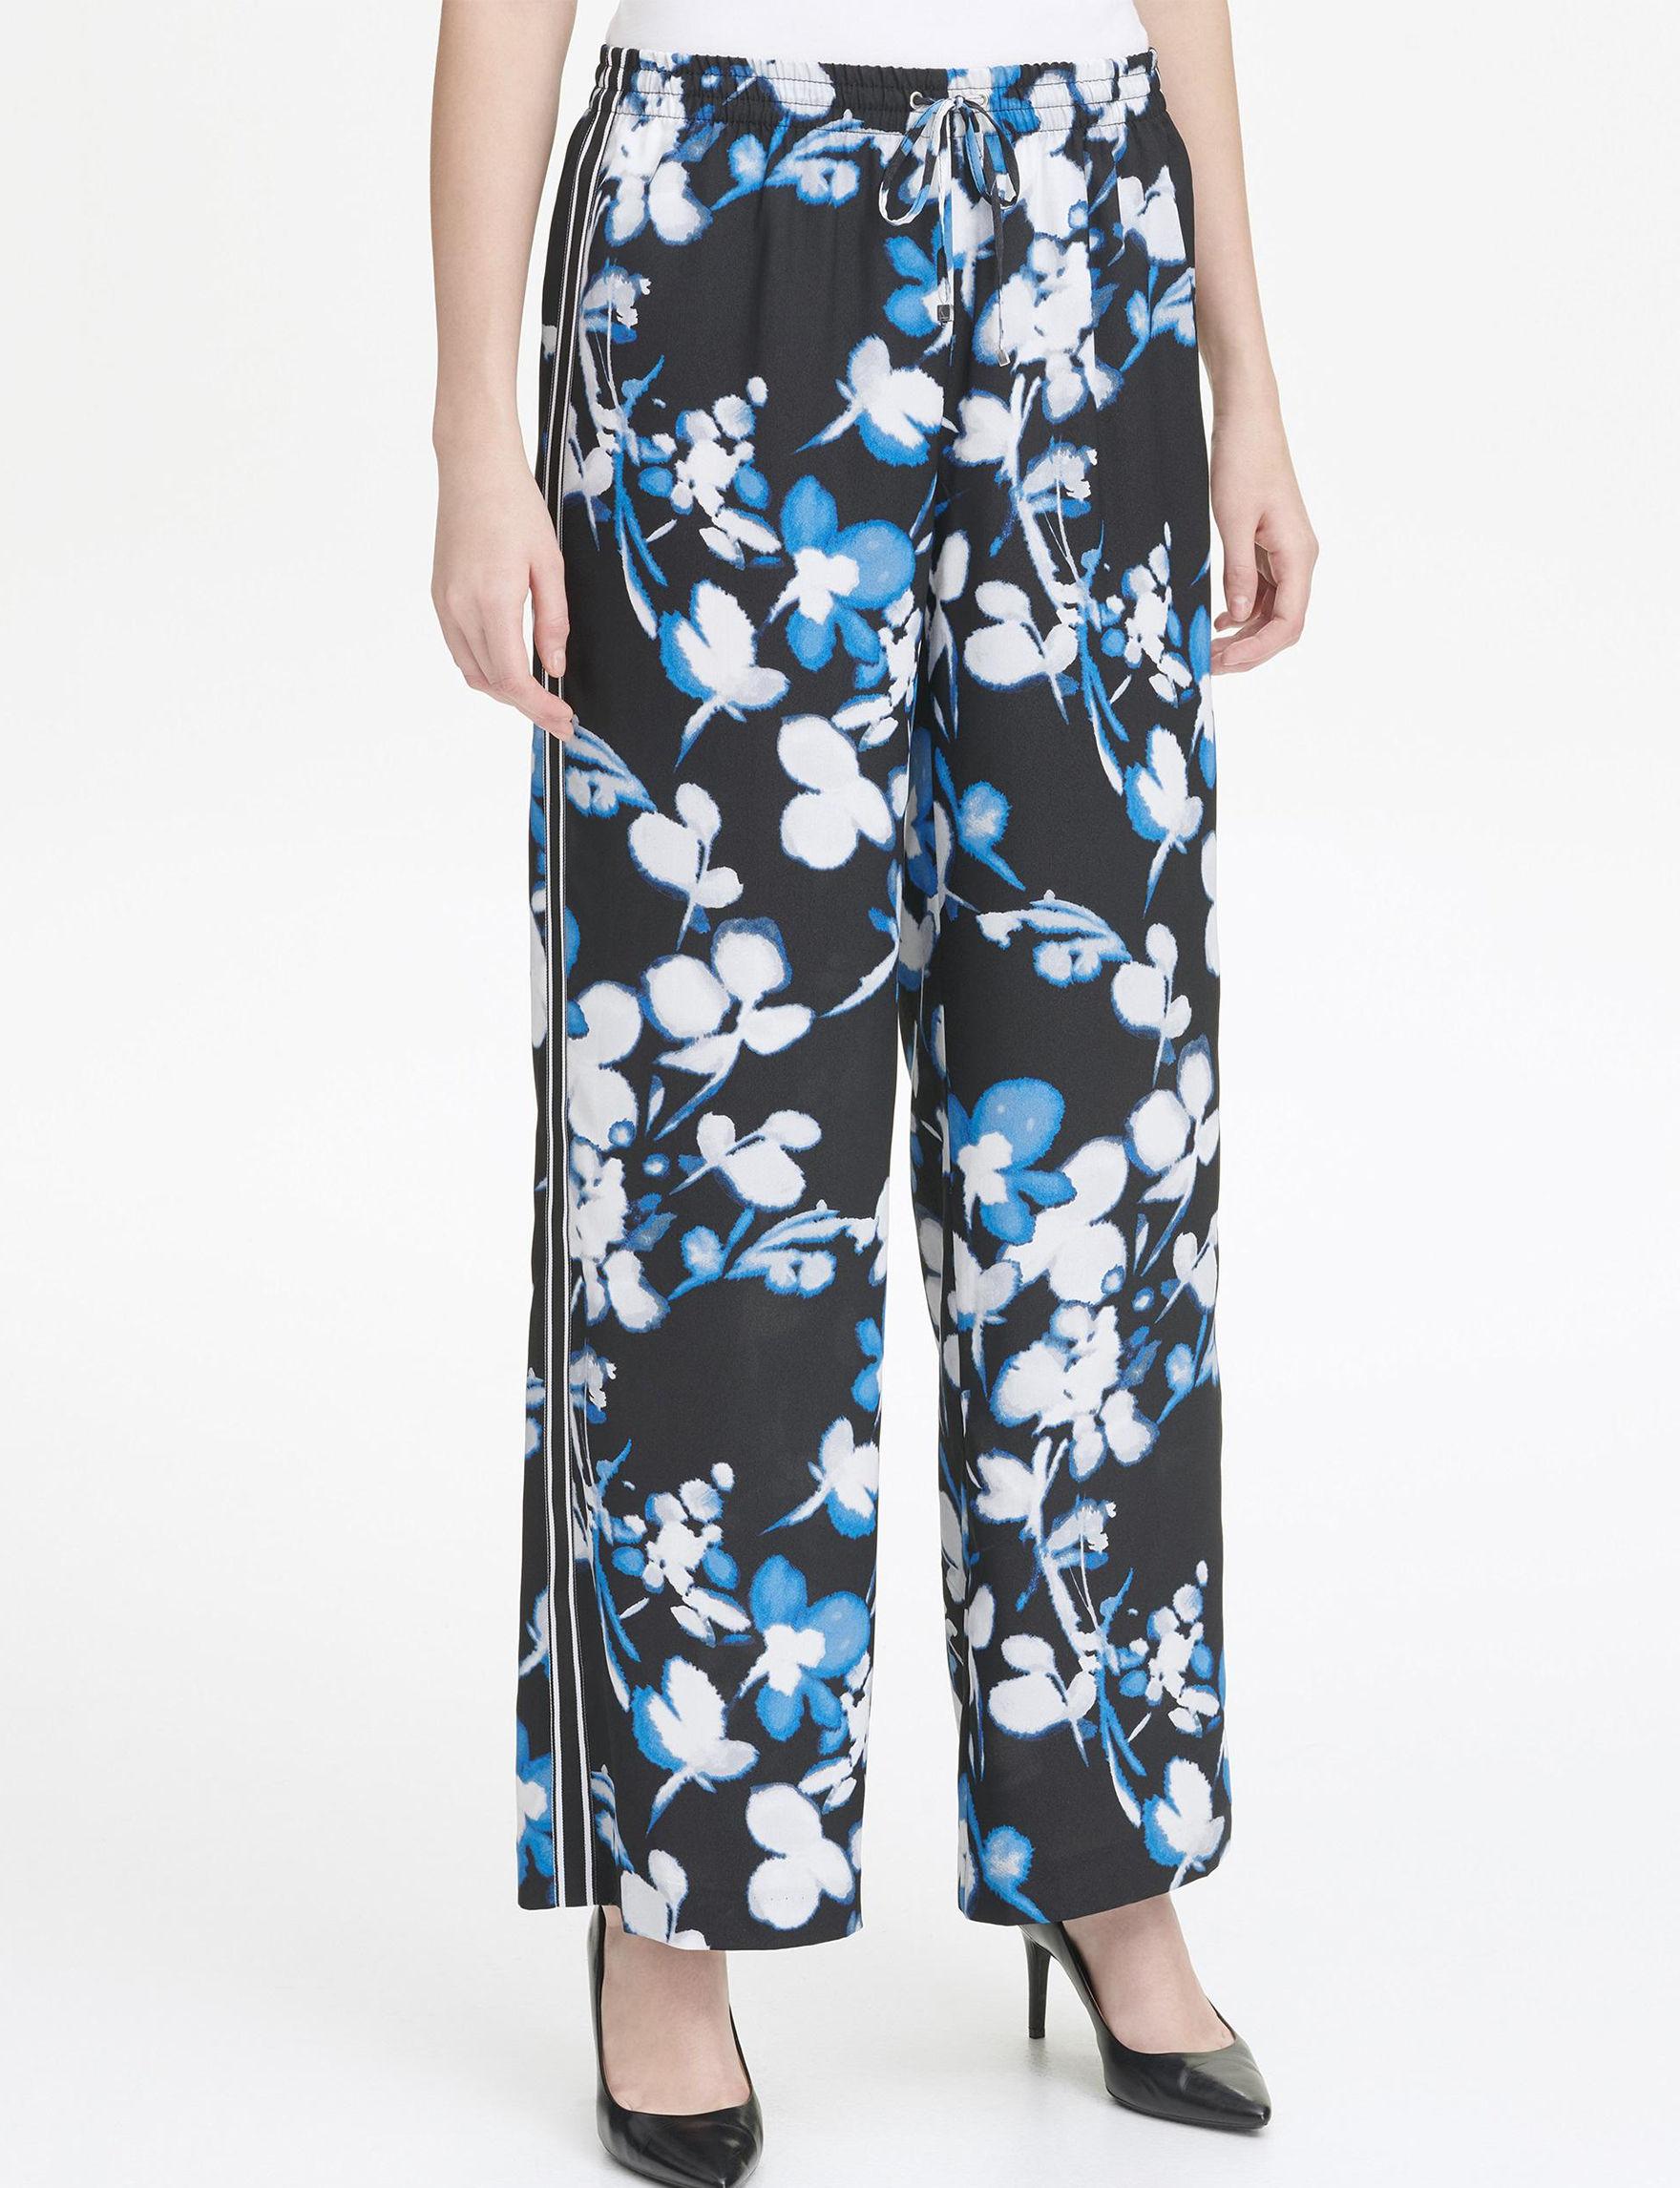 Calvin Klein Black Floral